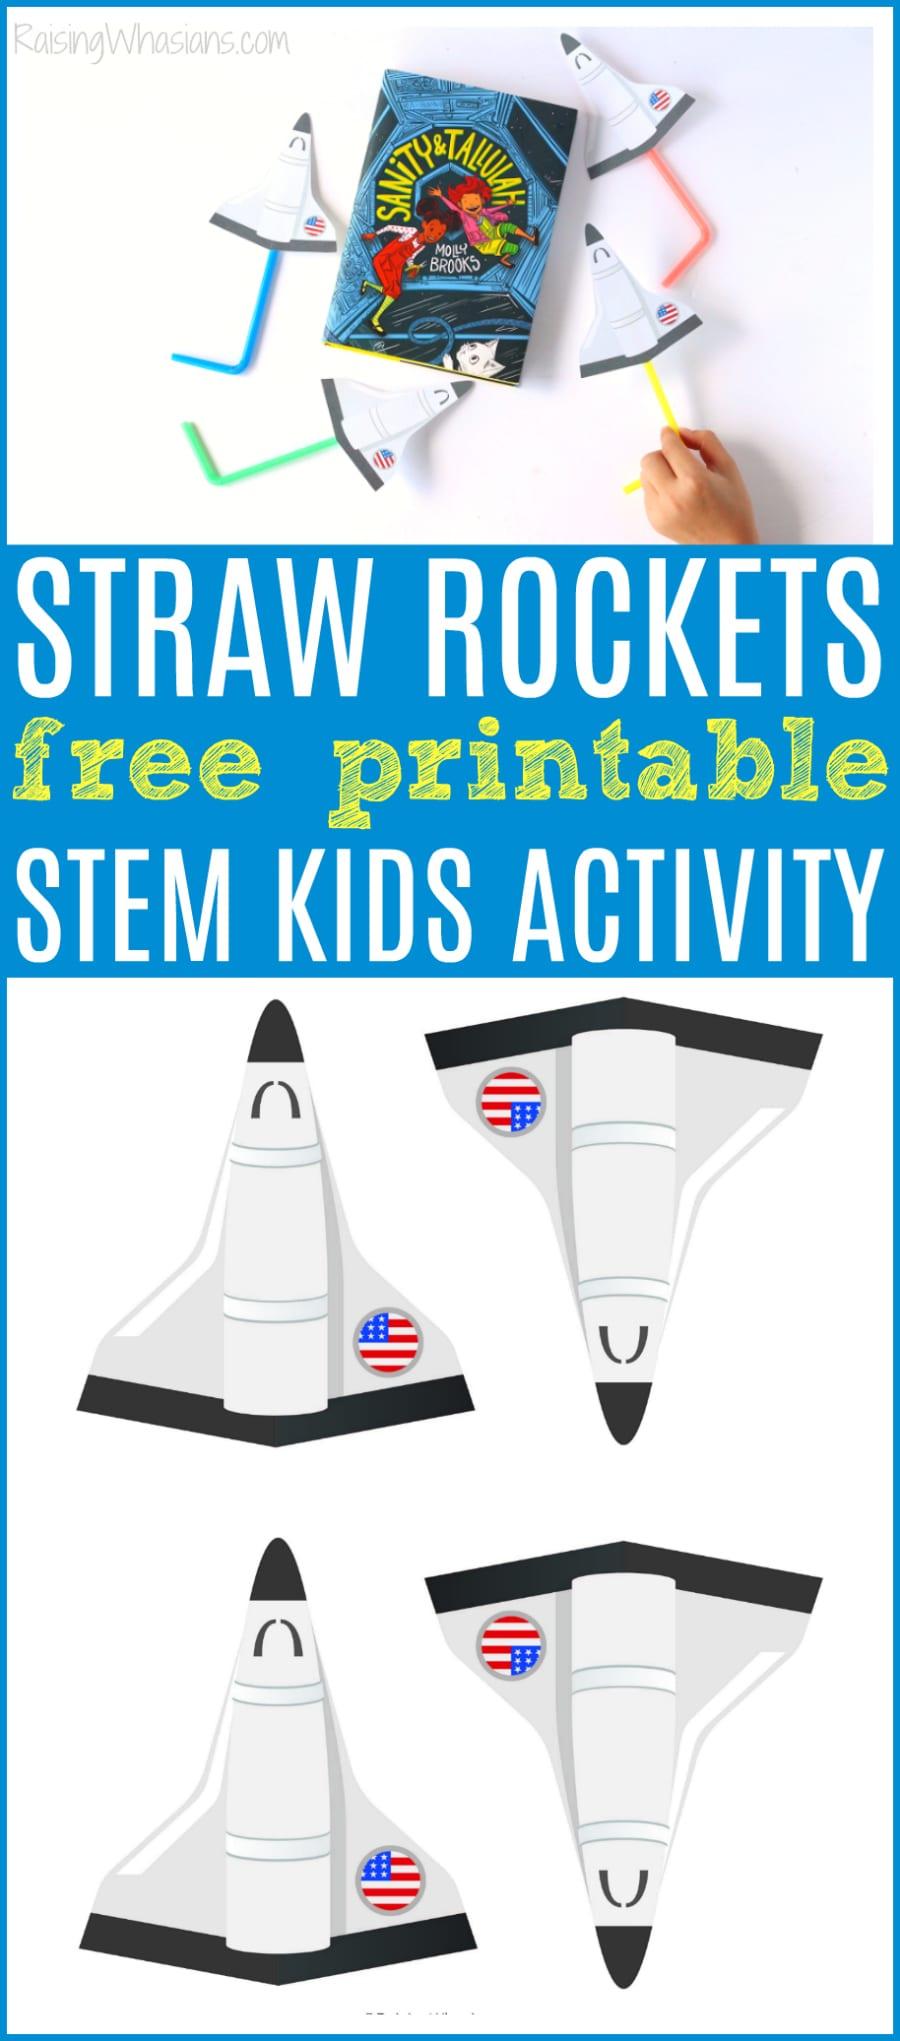 Straw rockets free printable